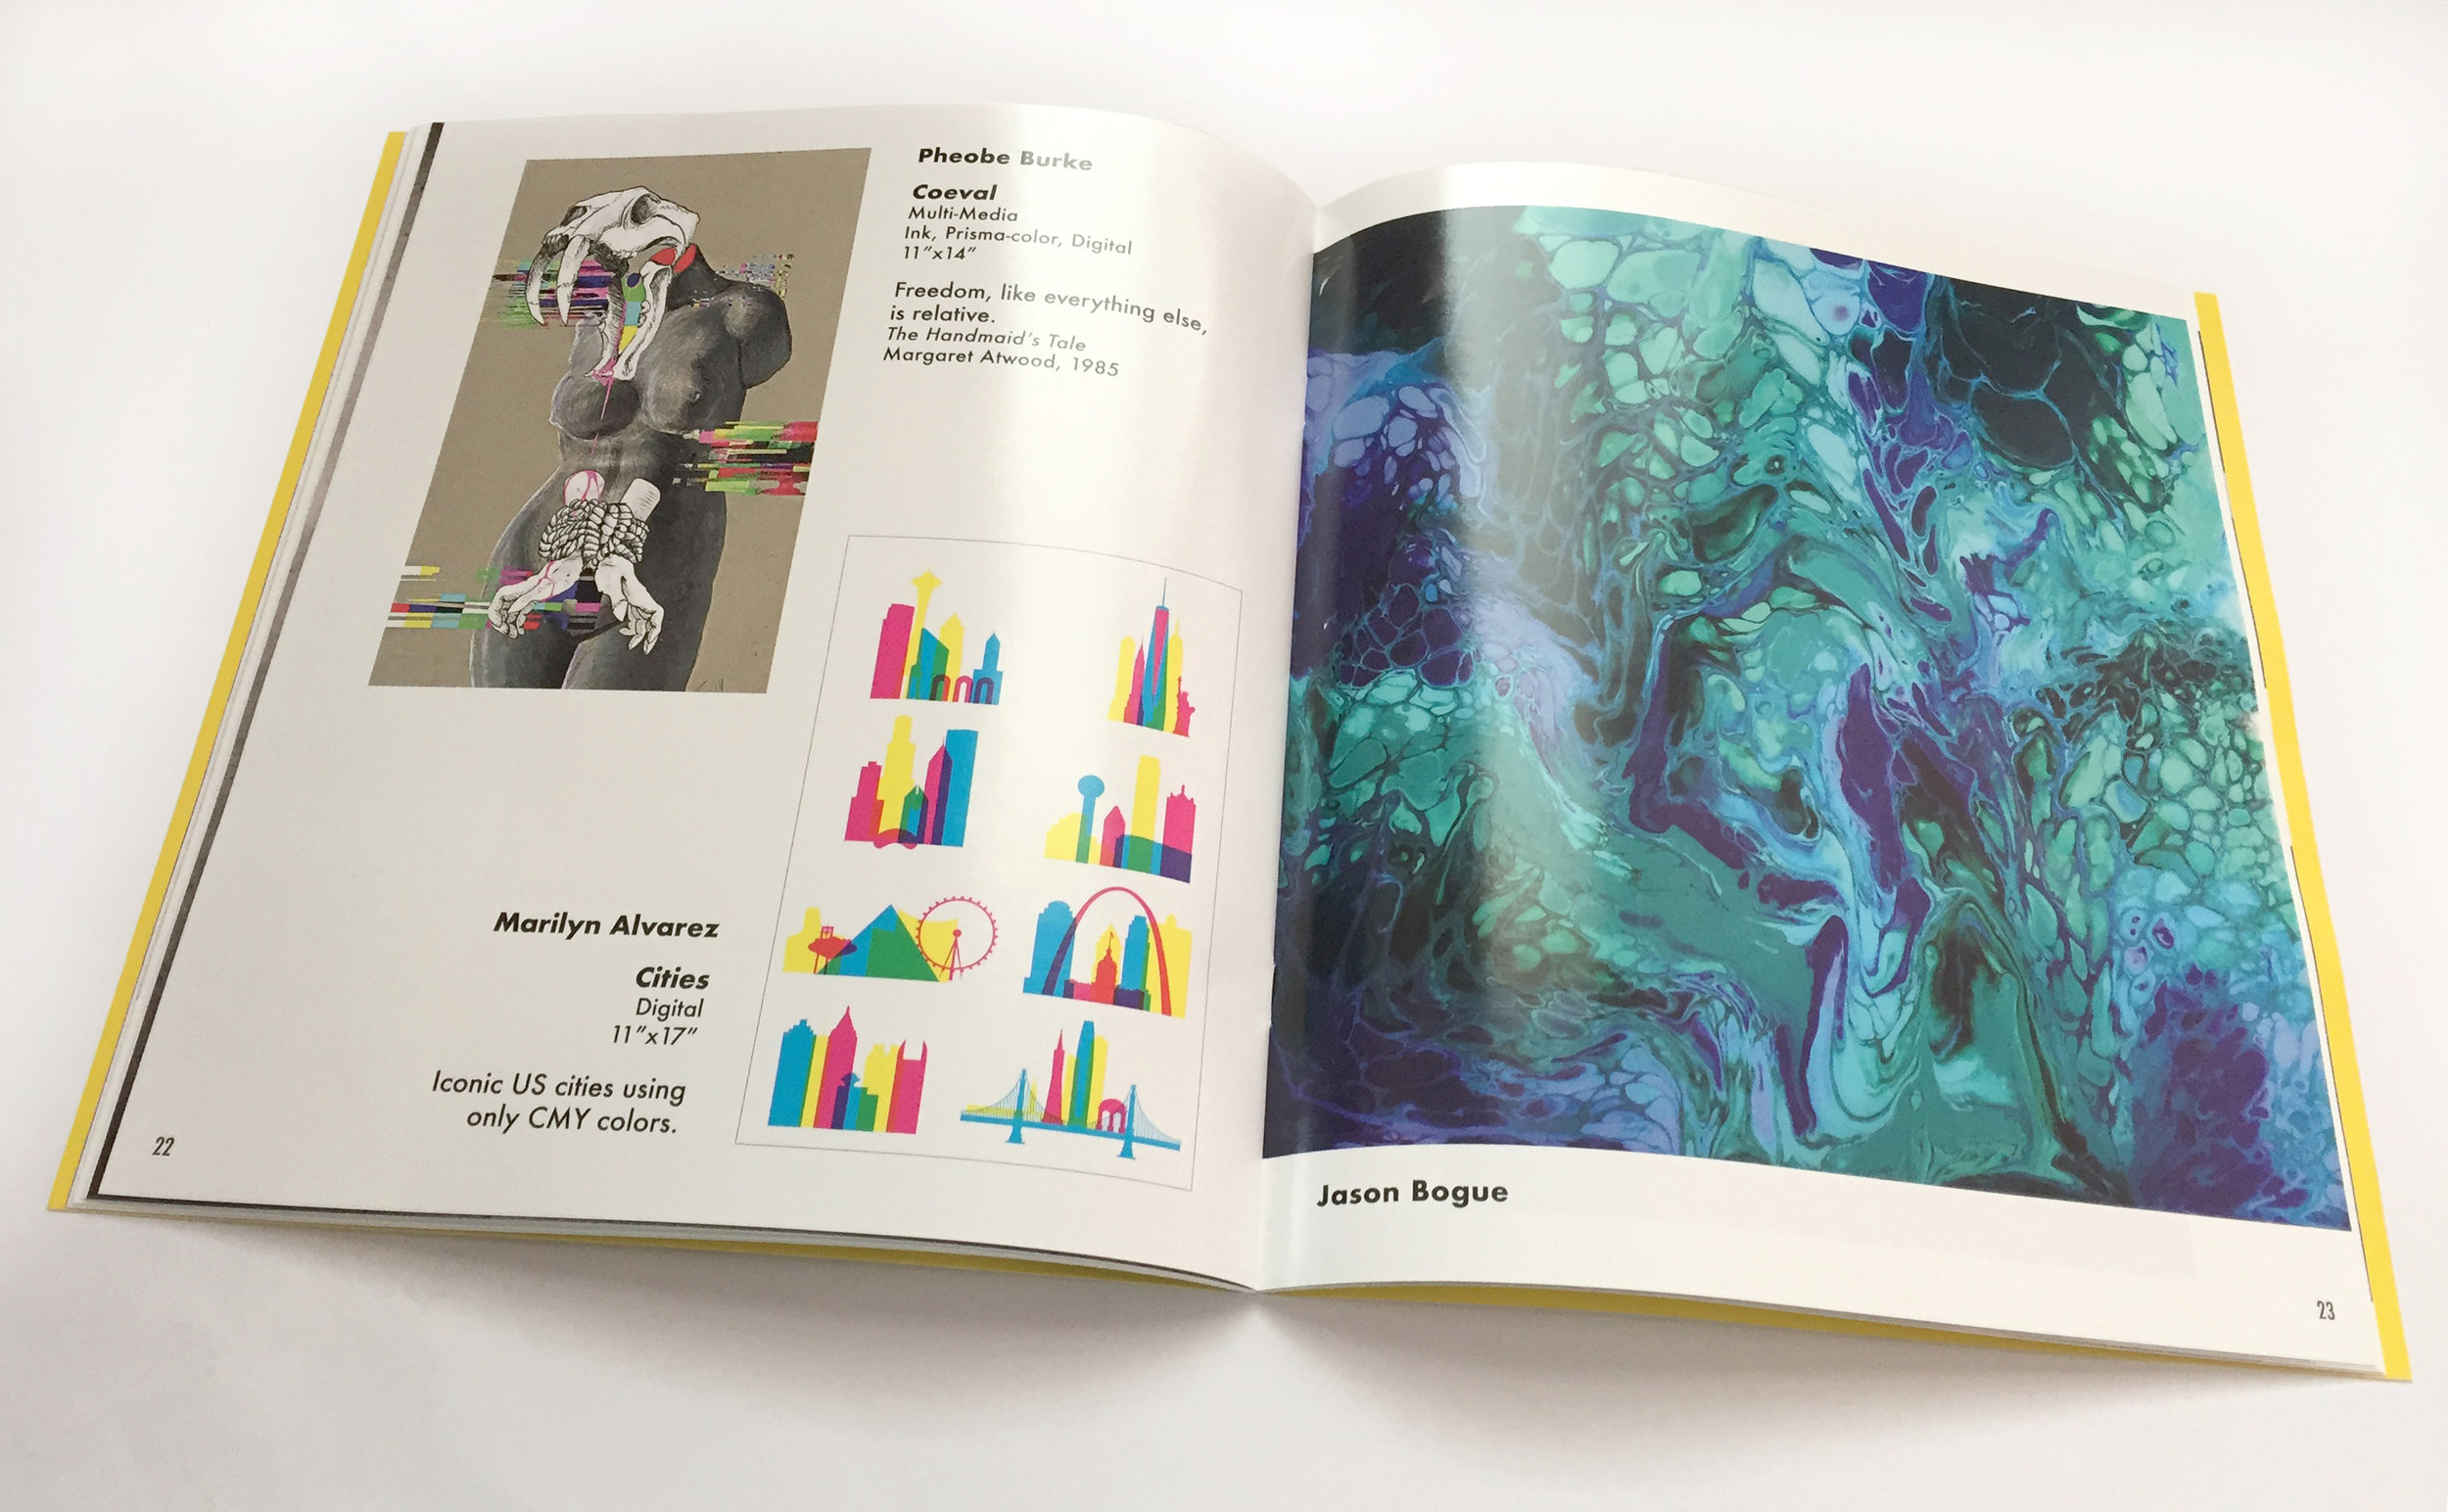 ART360 Publication & Layout - BLIXT 2018: Jaclyn Kidd